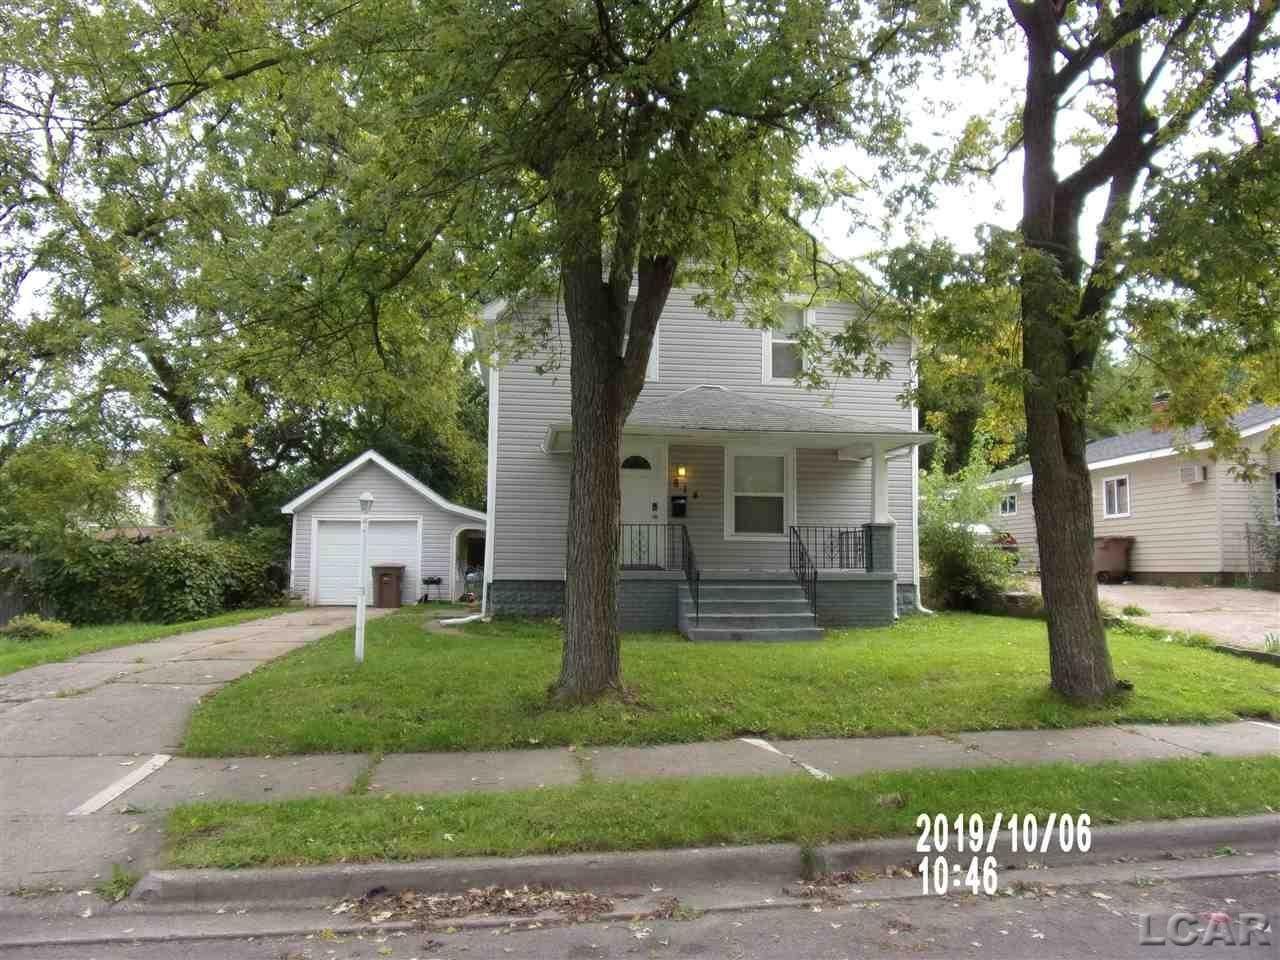 814 Robinwood St, Pontiac  (63142)